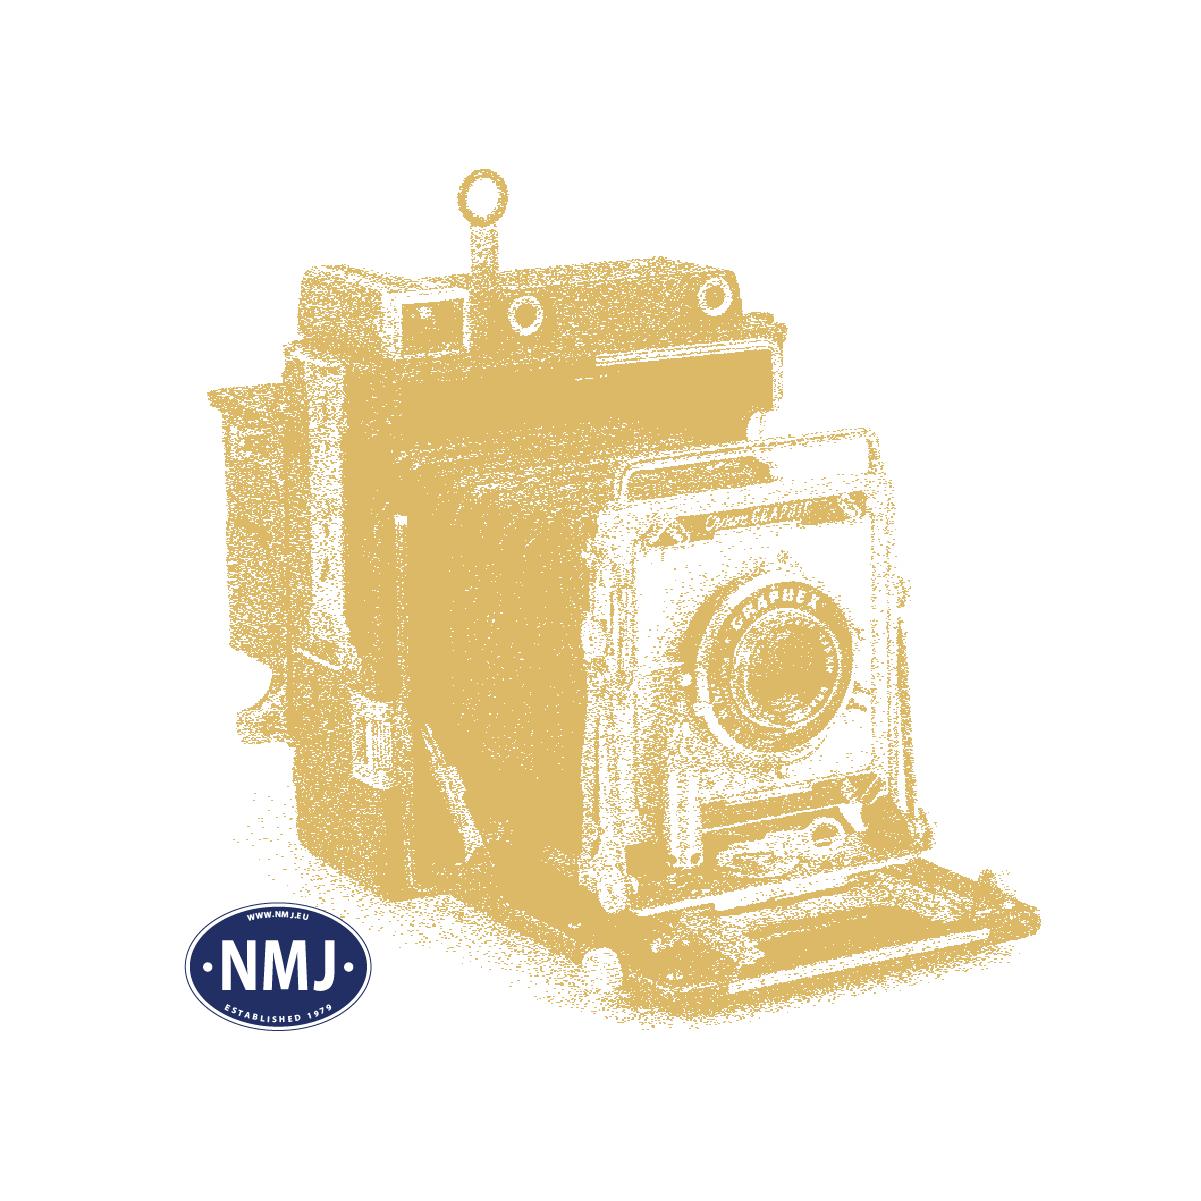 NMJT131.103 - NMJ Topline NSB B3-2 25512 type 3, Gammeldesign